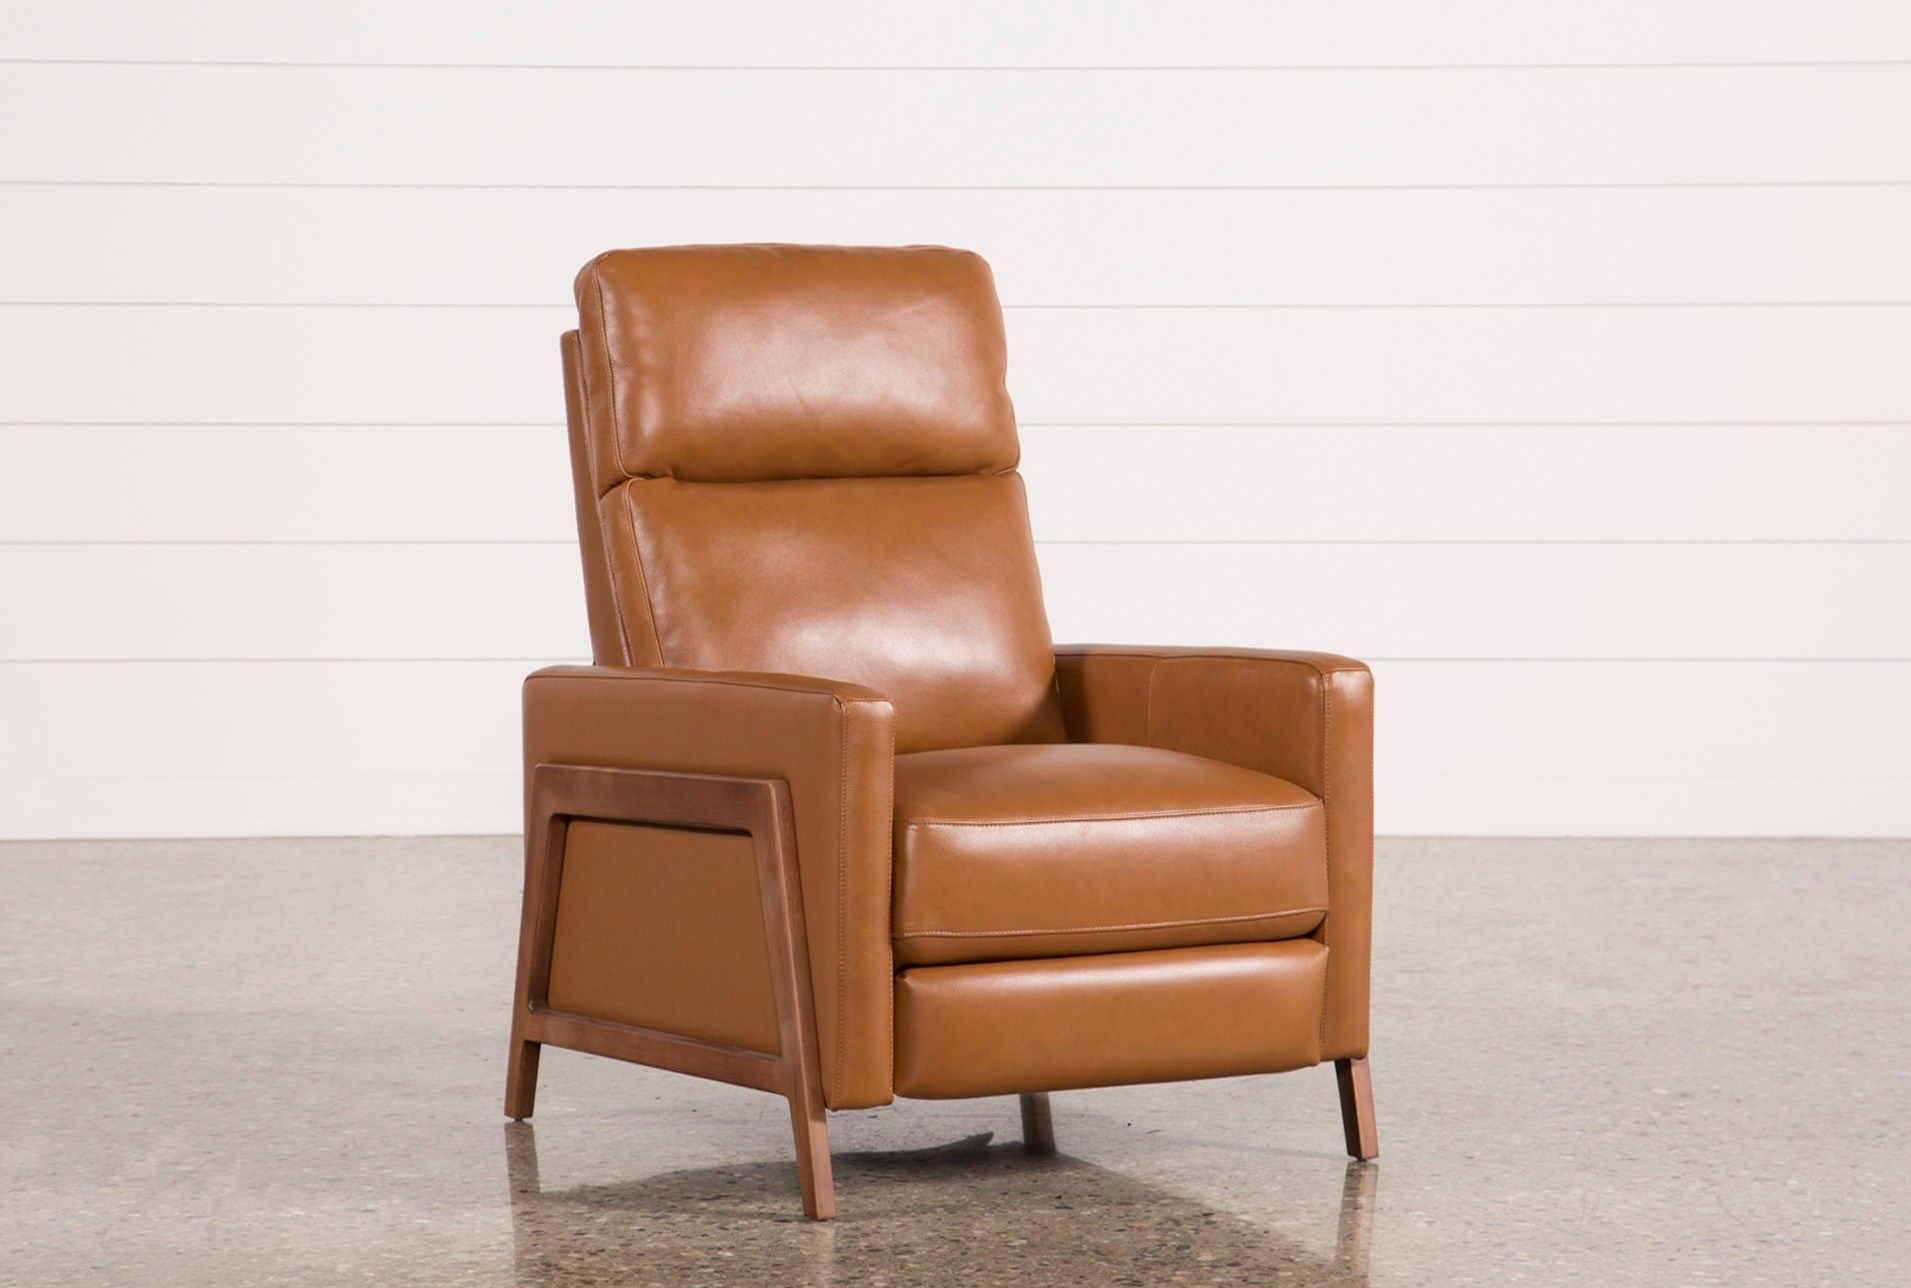 Daniel Nutmeg Leather Pressback Recliner Recliner Leather Recliner Modern Seat Cushions